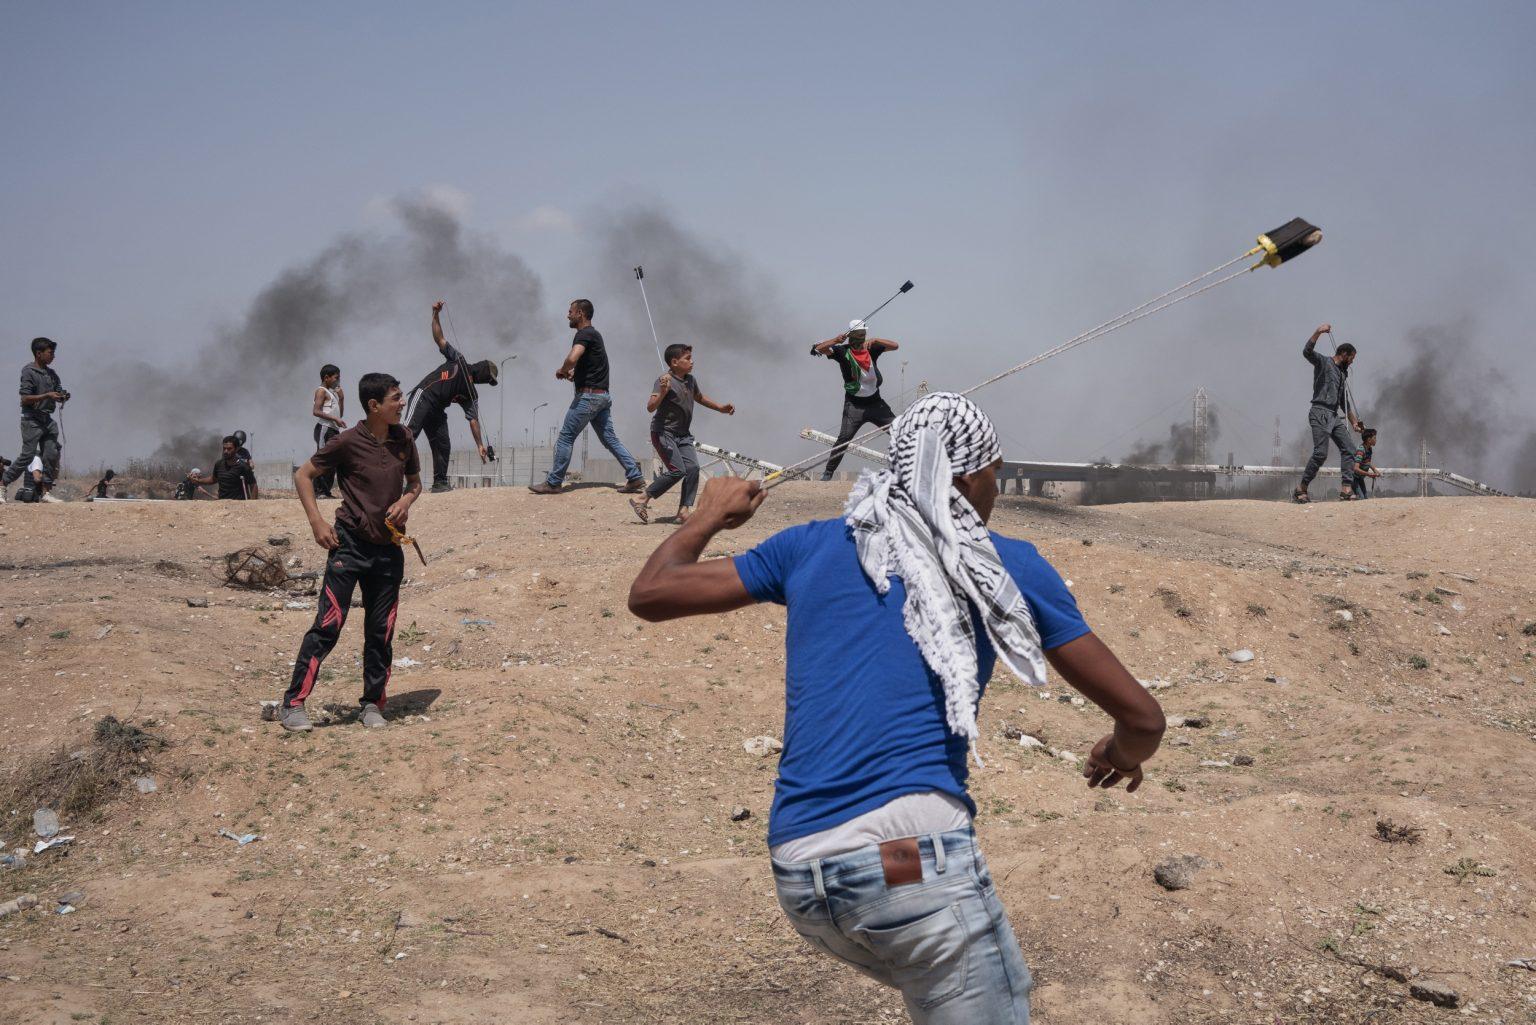 Gaza Strip, May 2018 - Palestinian protesters use slingshots to throw stones near the border fence with Israel during the demonstration. >< Striscia di Gaza, maggio 2018 - Dimostranti palestinesi usano delle fionde per lanciare sassi verso il confine israeliano.